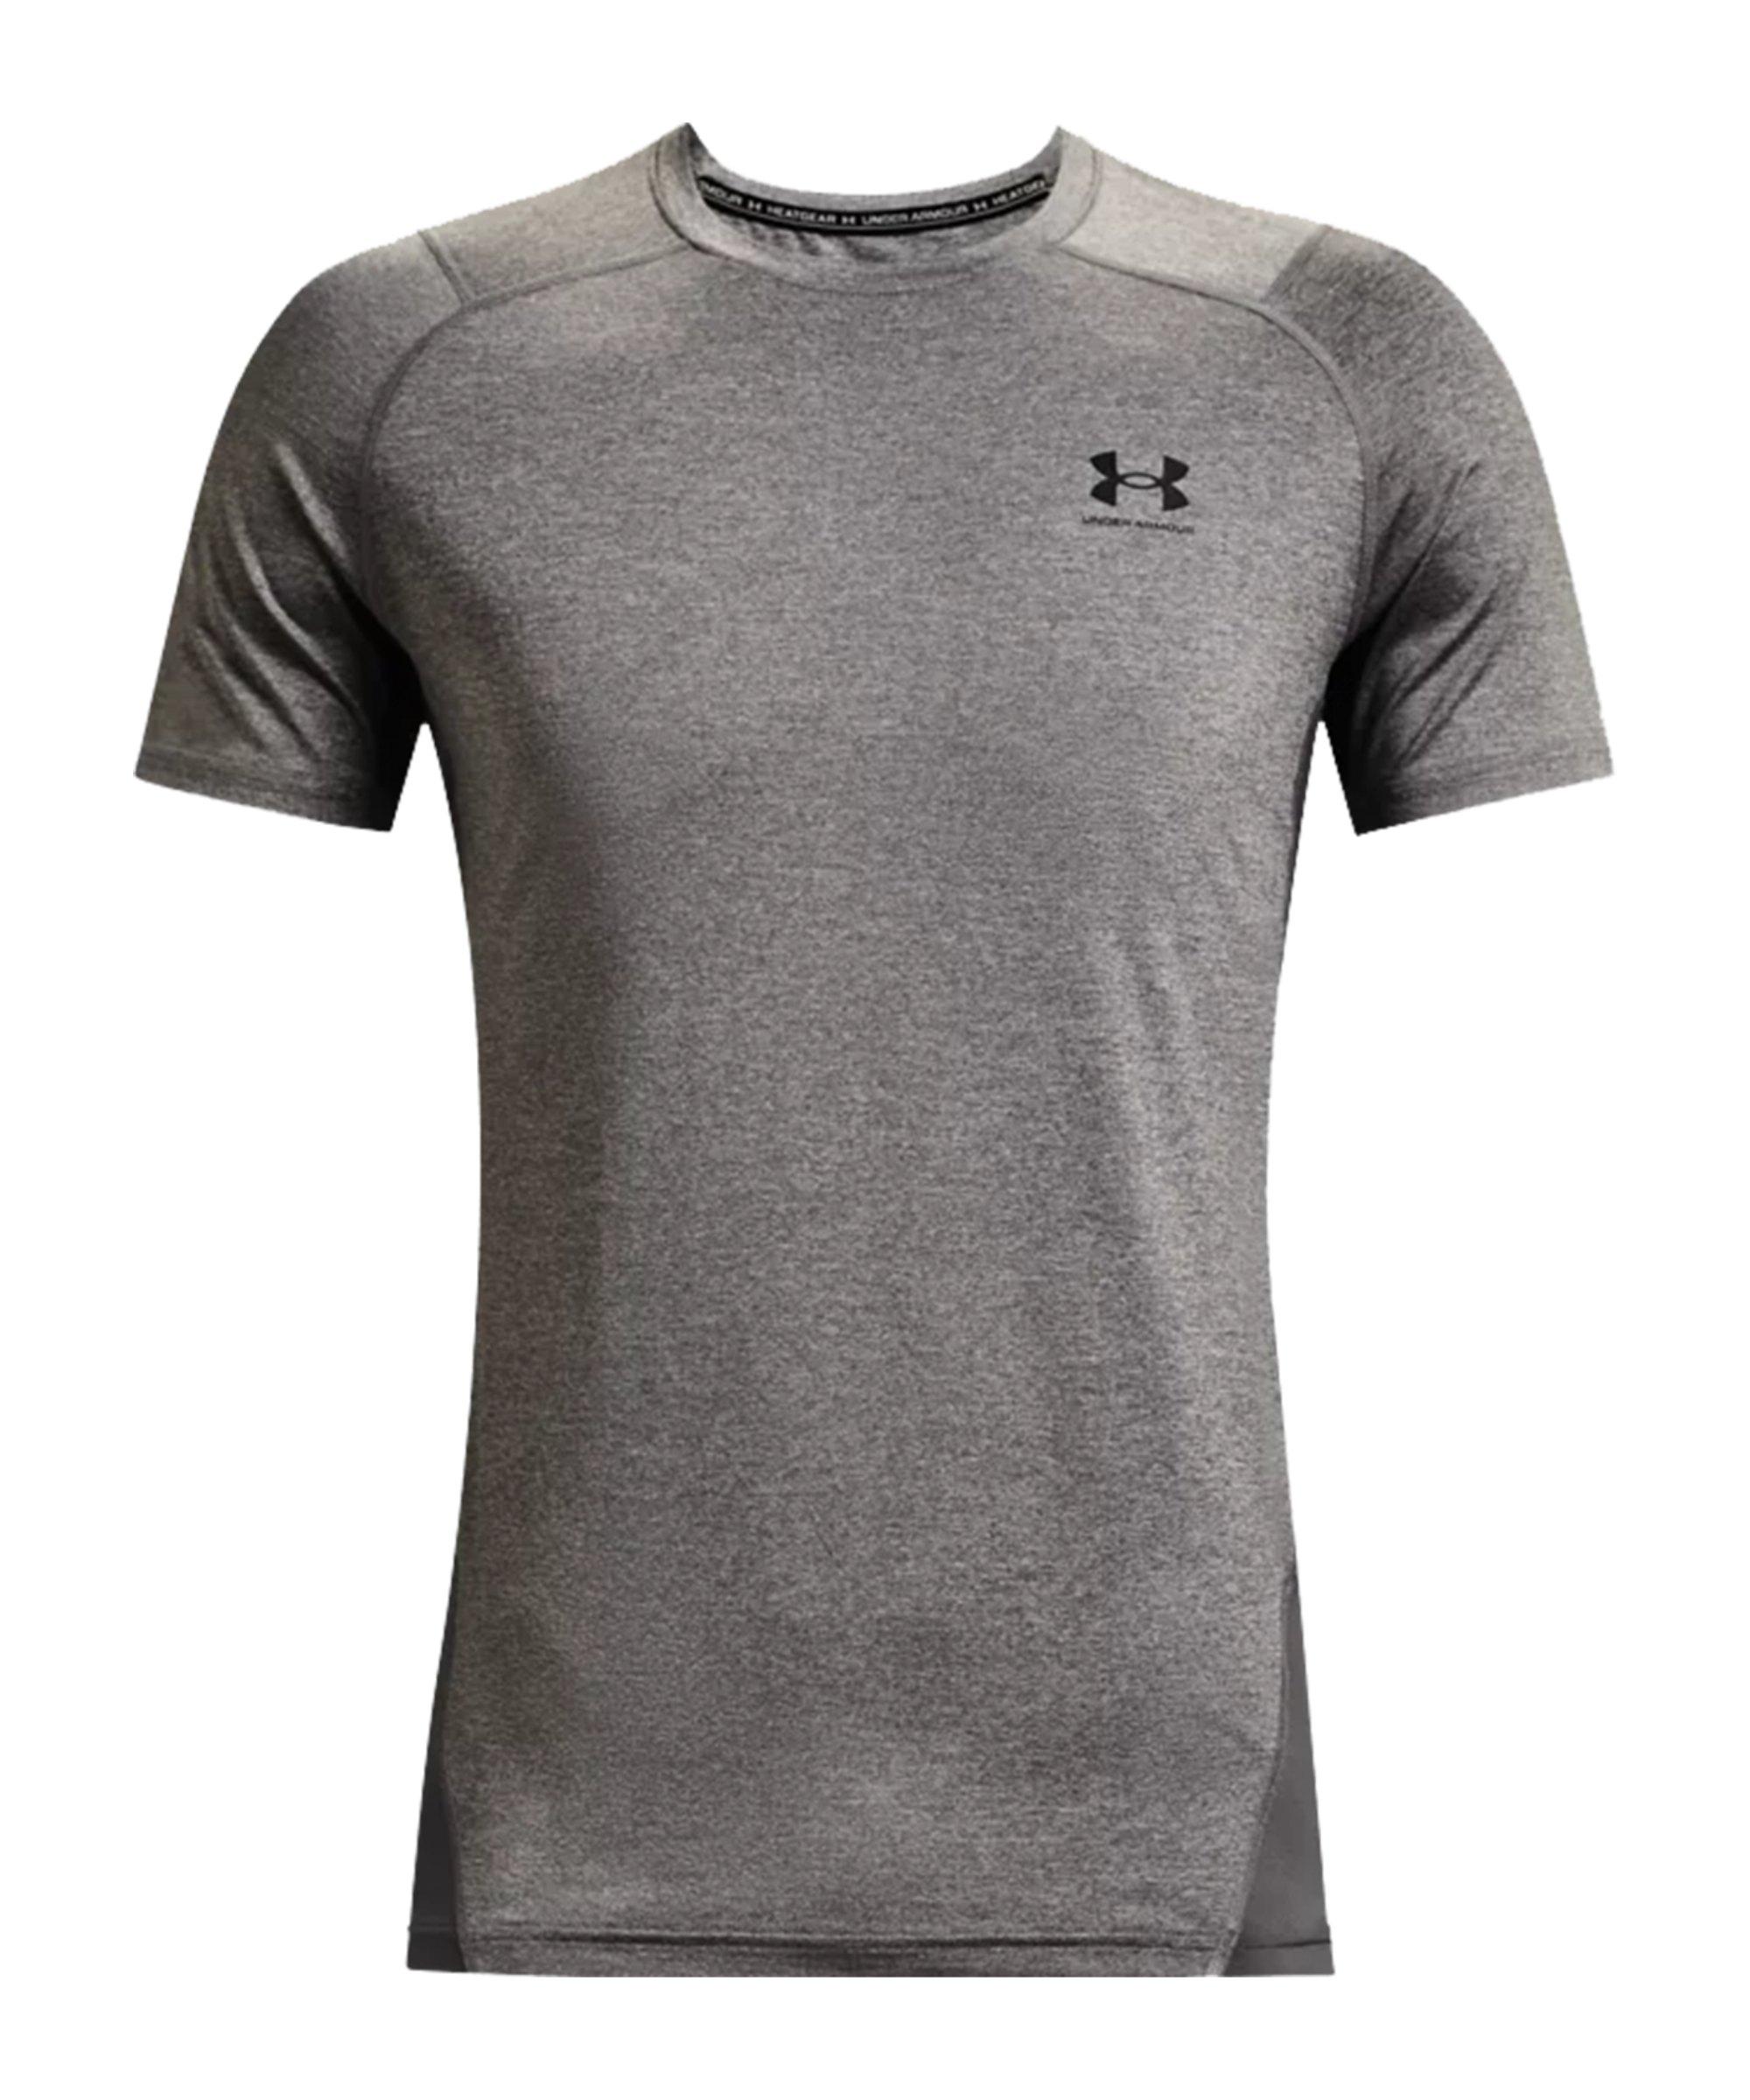 Under Armour HG Fitted T-Shirt Grau F090 - grau